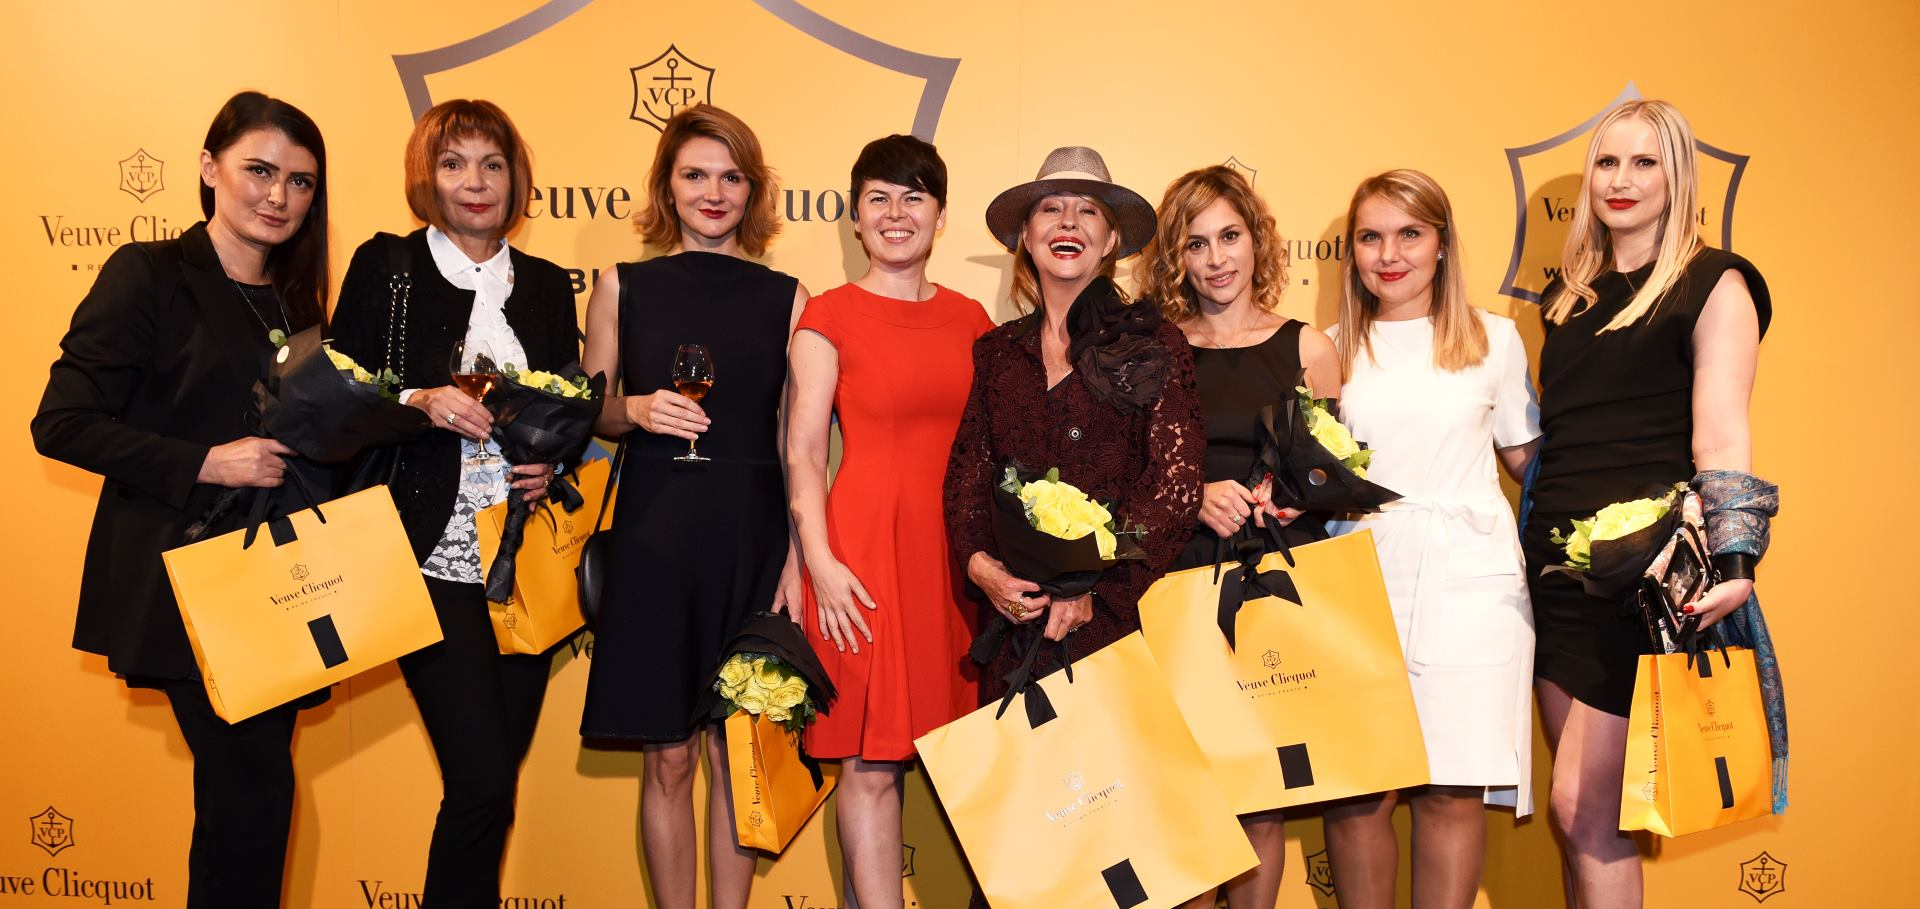 FOTO: Održana dodjela prestižne Veuve Clicquot Business Woman Award